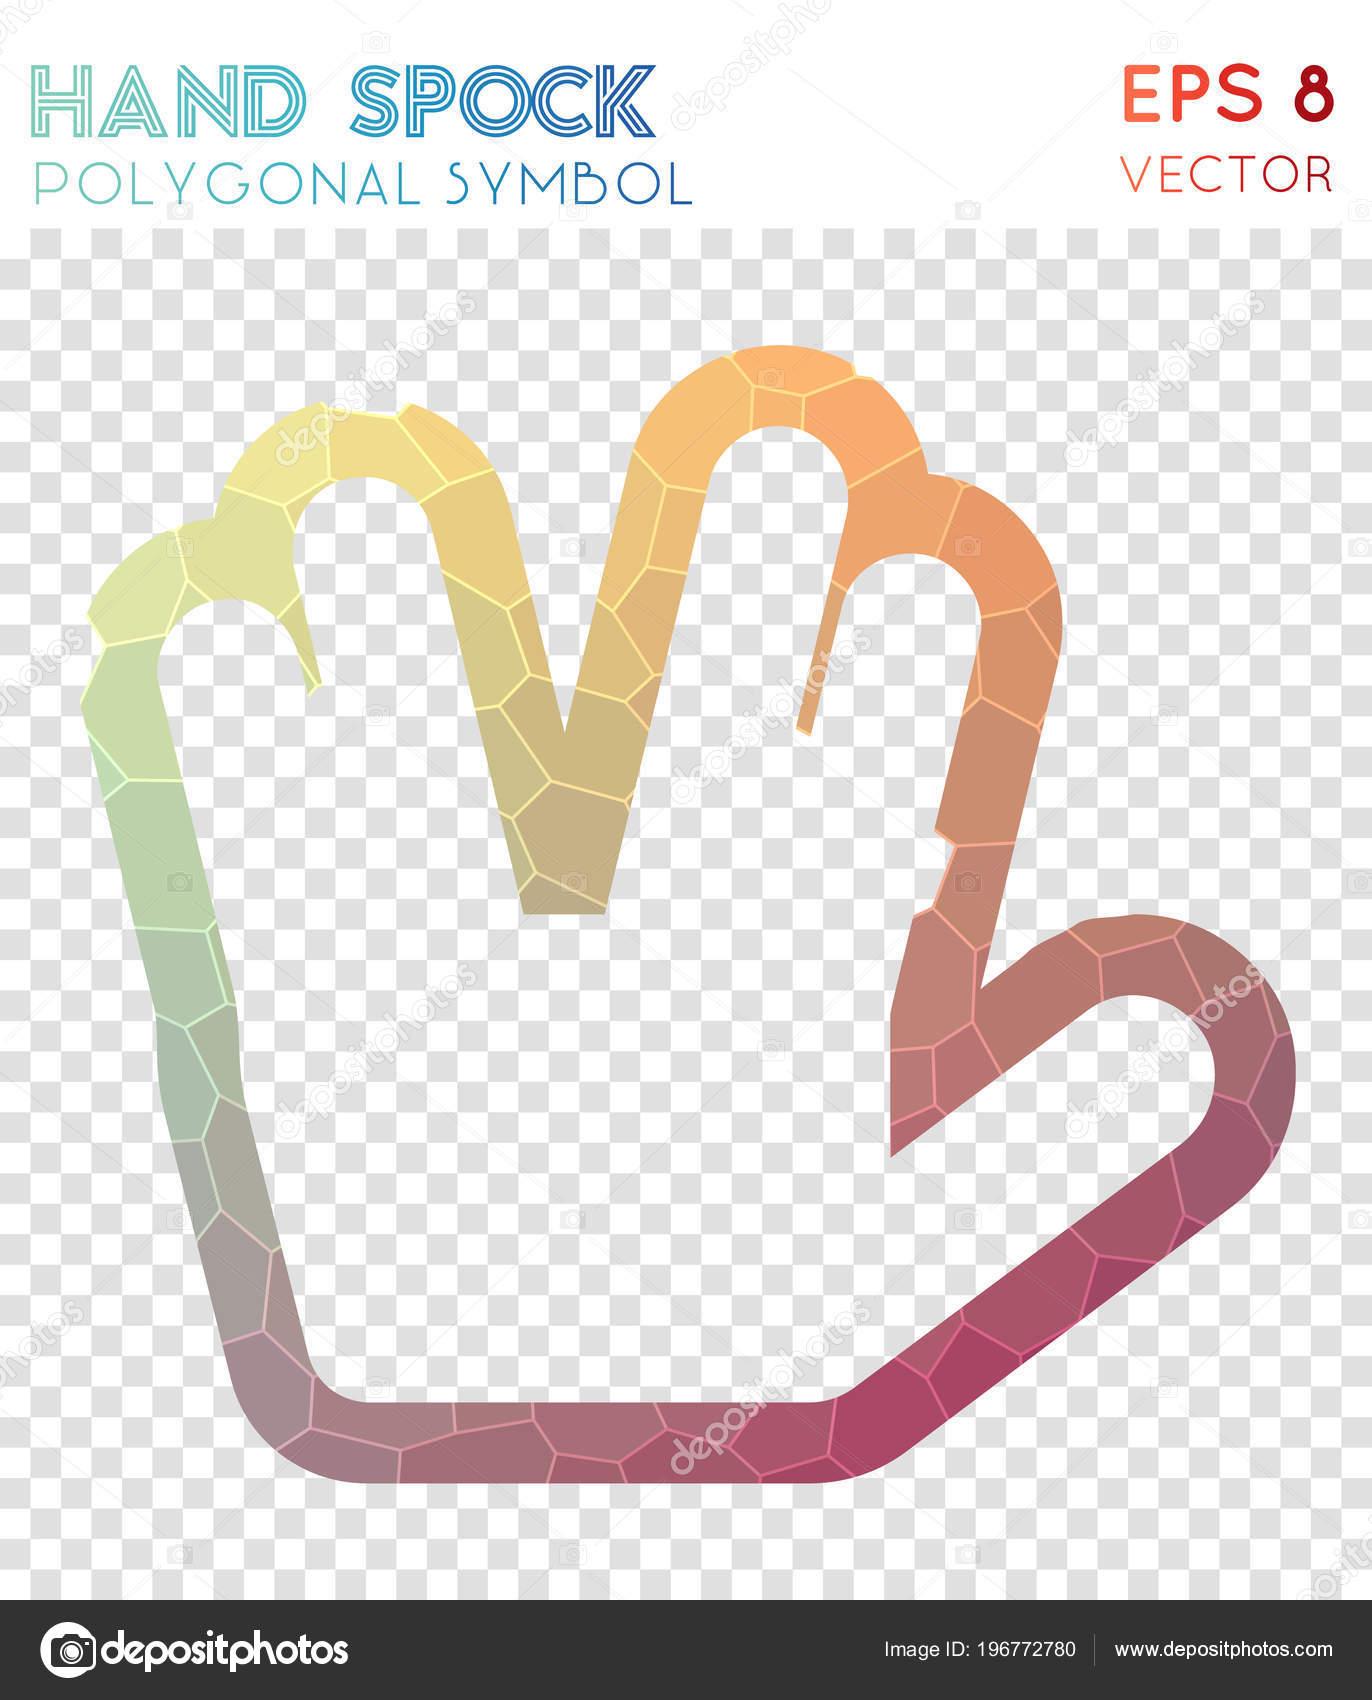 Hand Spock O Polygonal Symbol Appealing Mosaic Style Symbol Classy